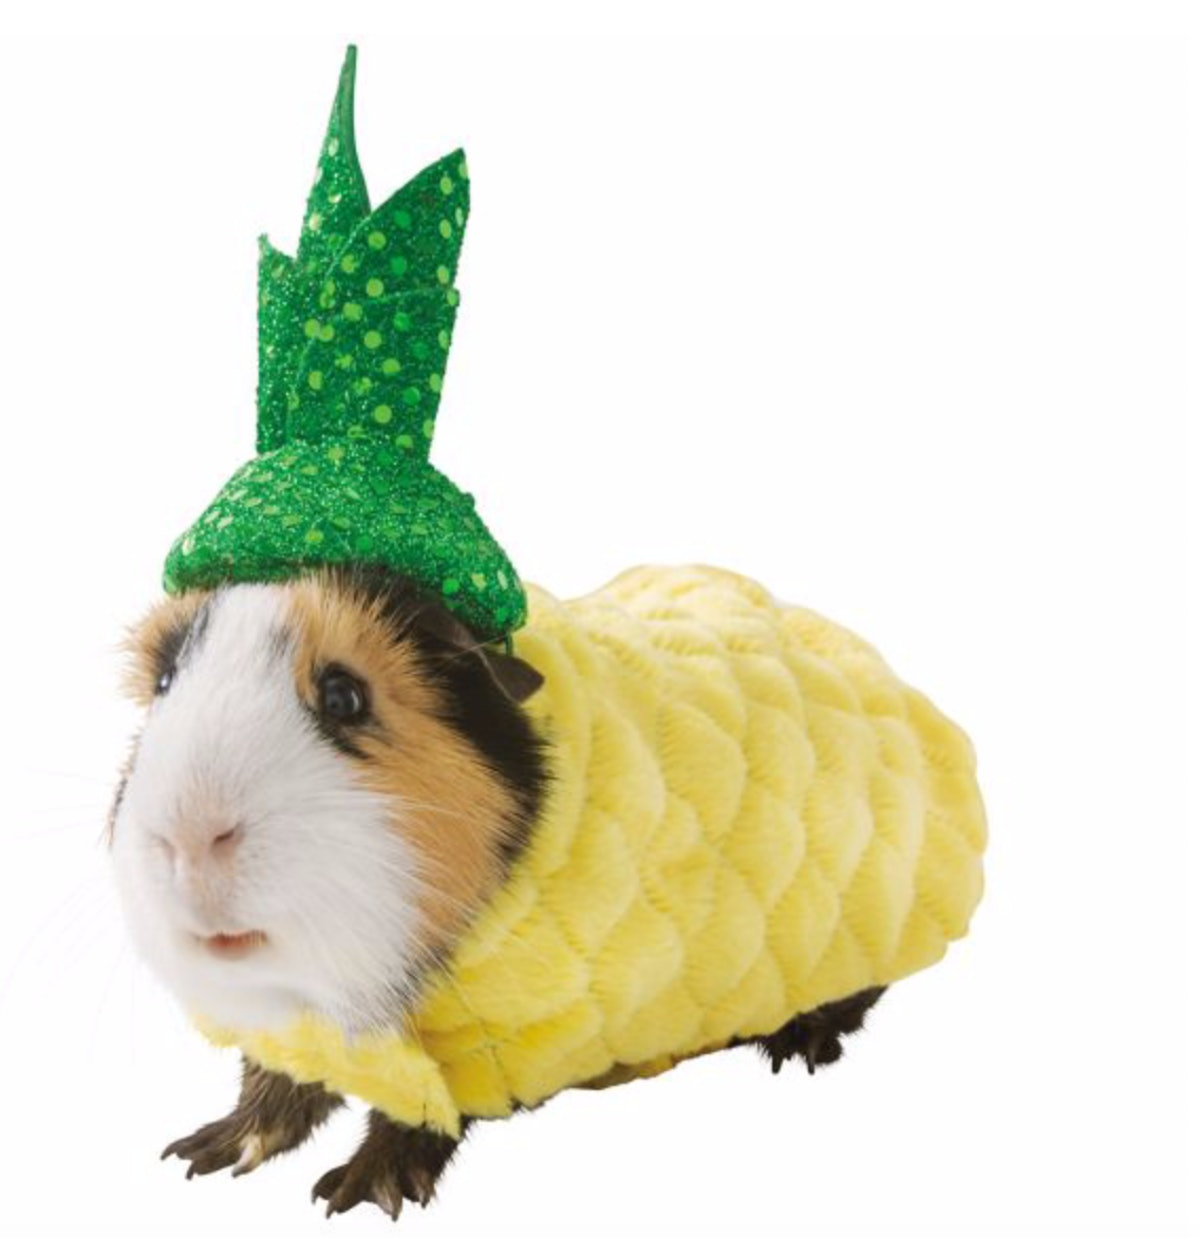 Thrills & Chills™ Pineapple Small Pet Costume